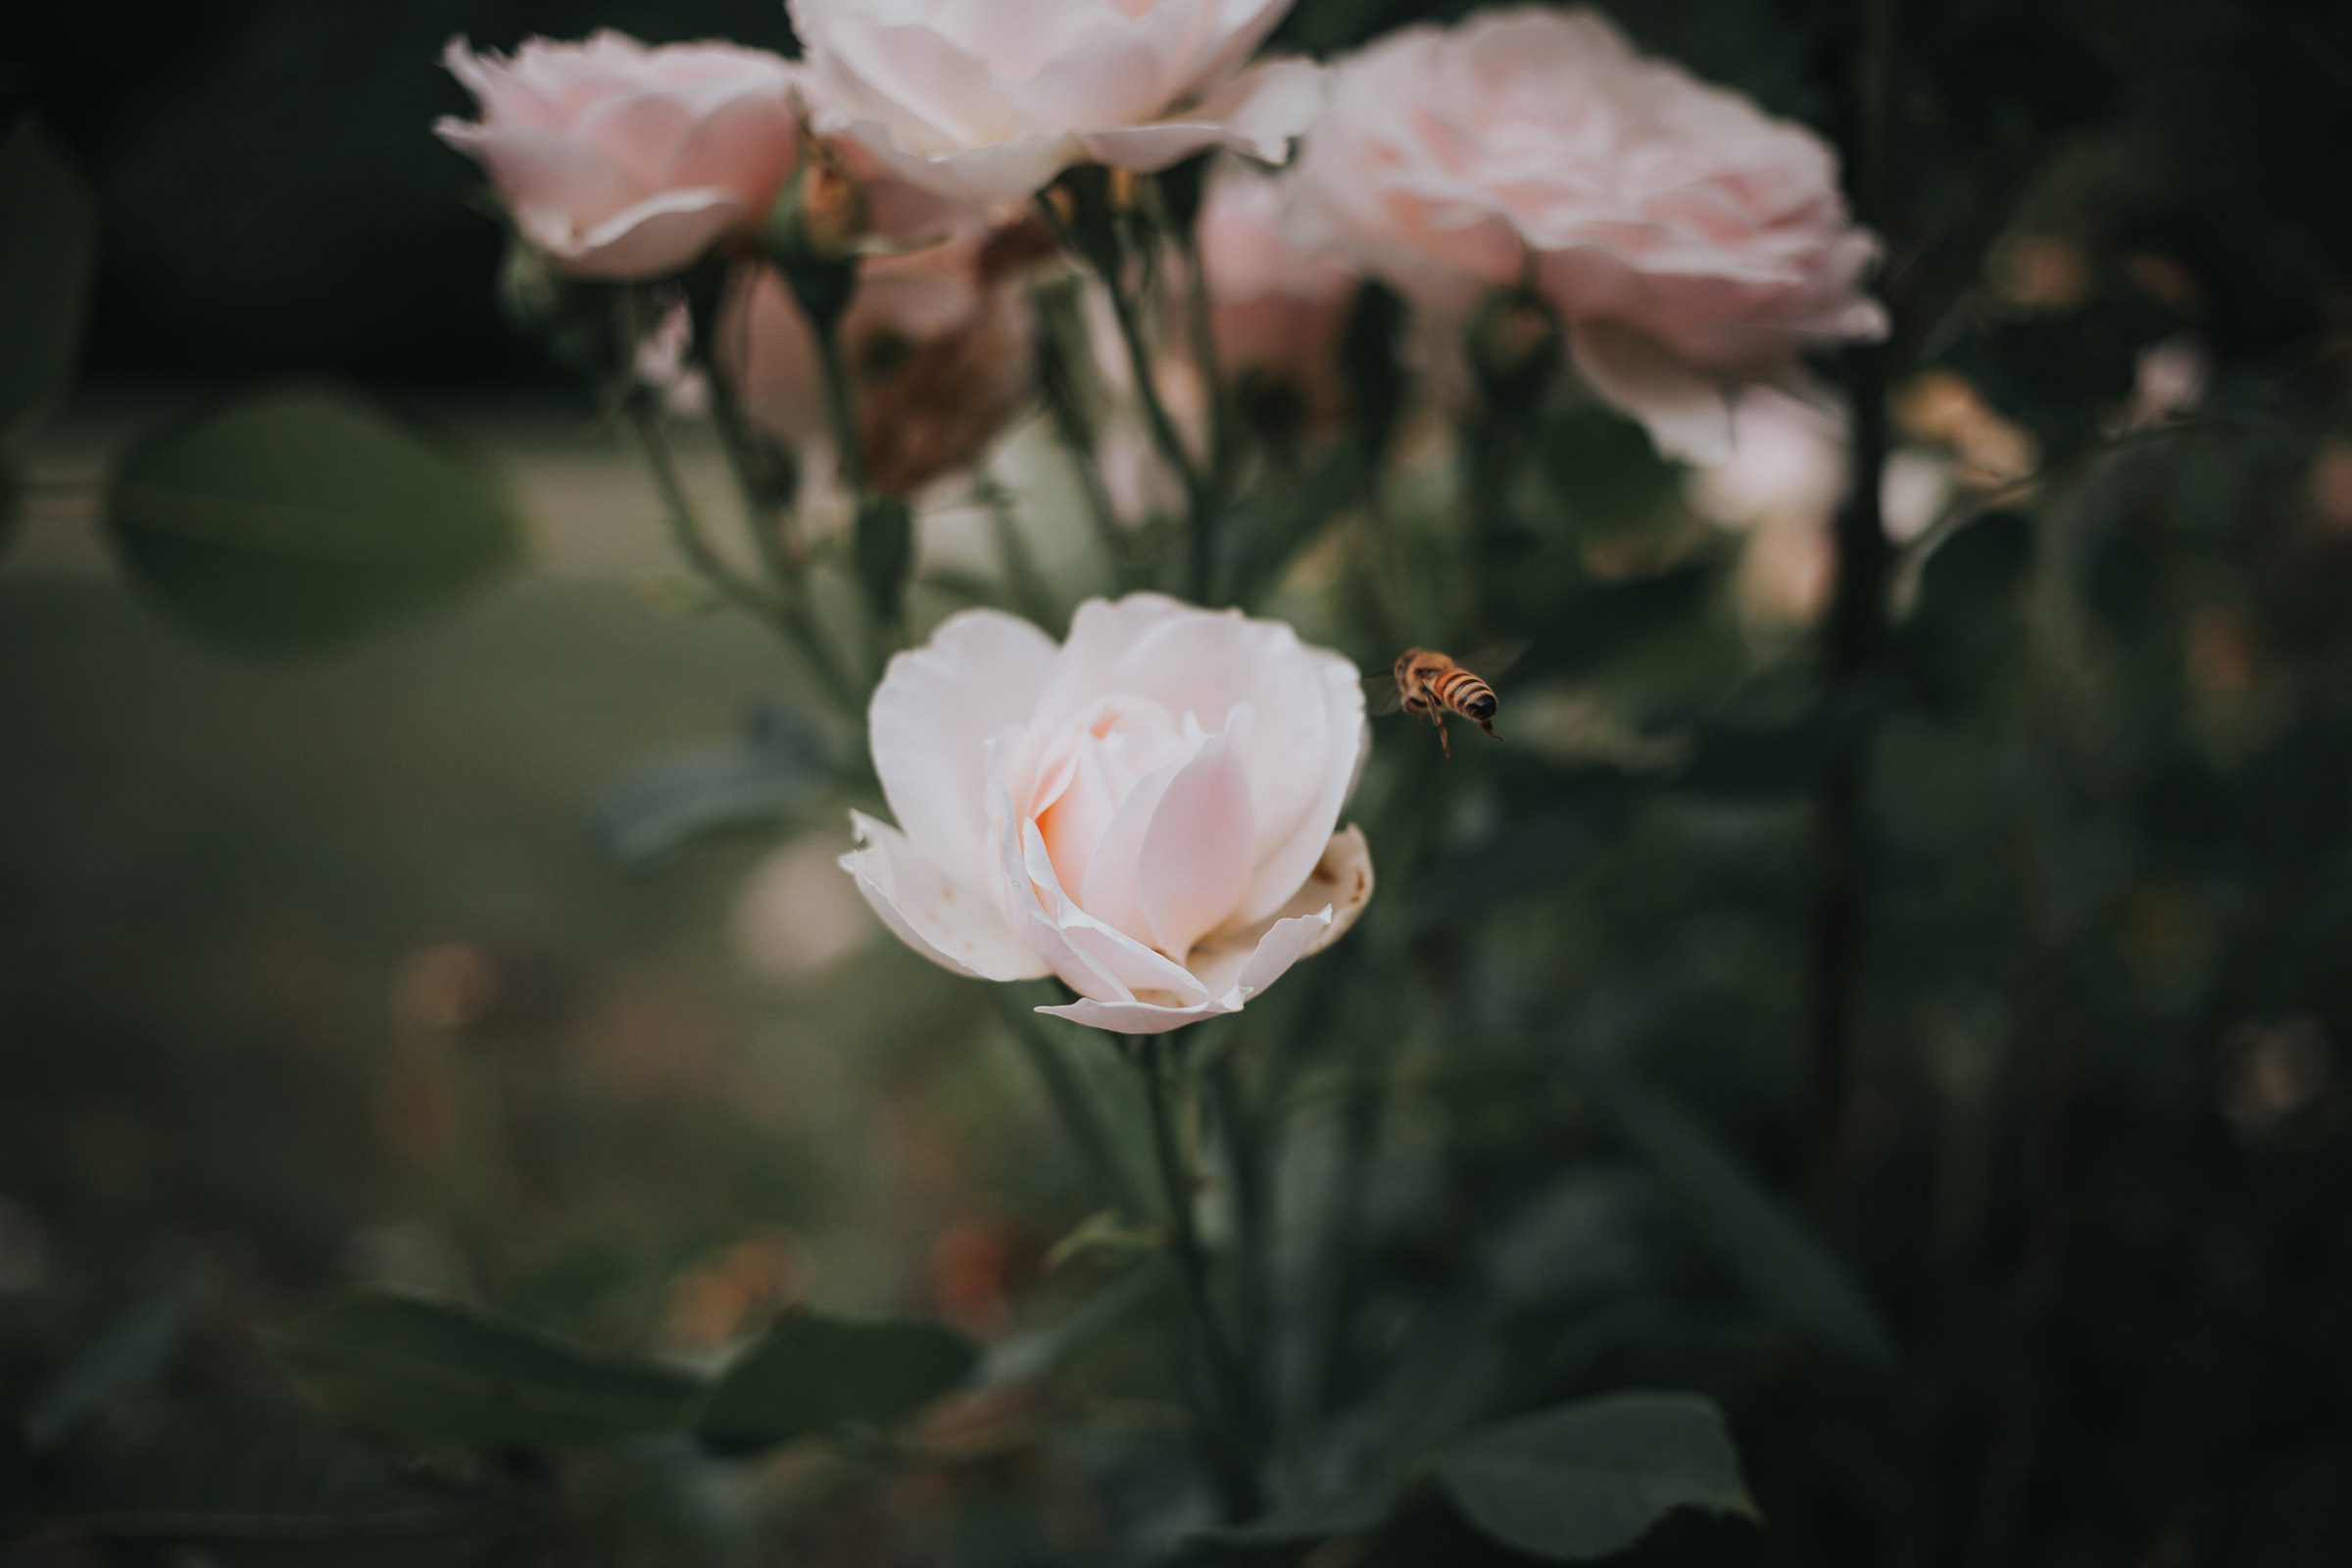 bee-on-rose-during-wedding-ceremony-desmoines-iowa-rose-garden-raelyn-ramey-photography.jpg